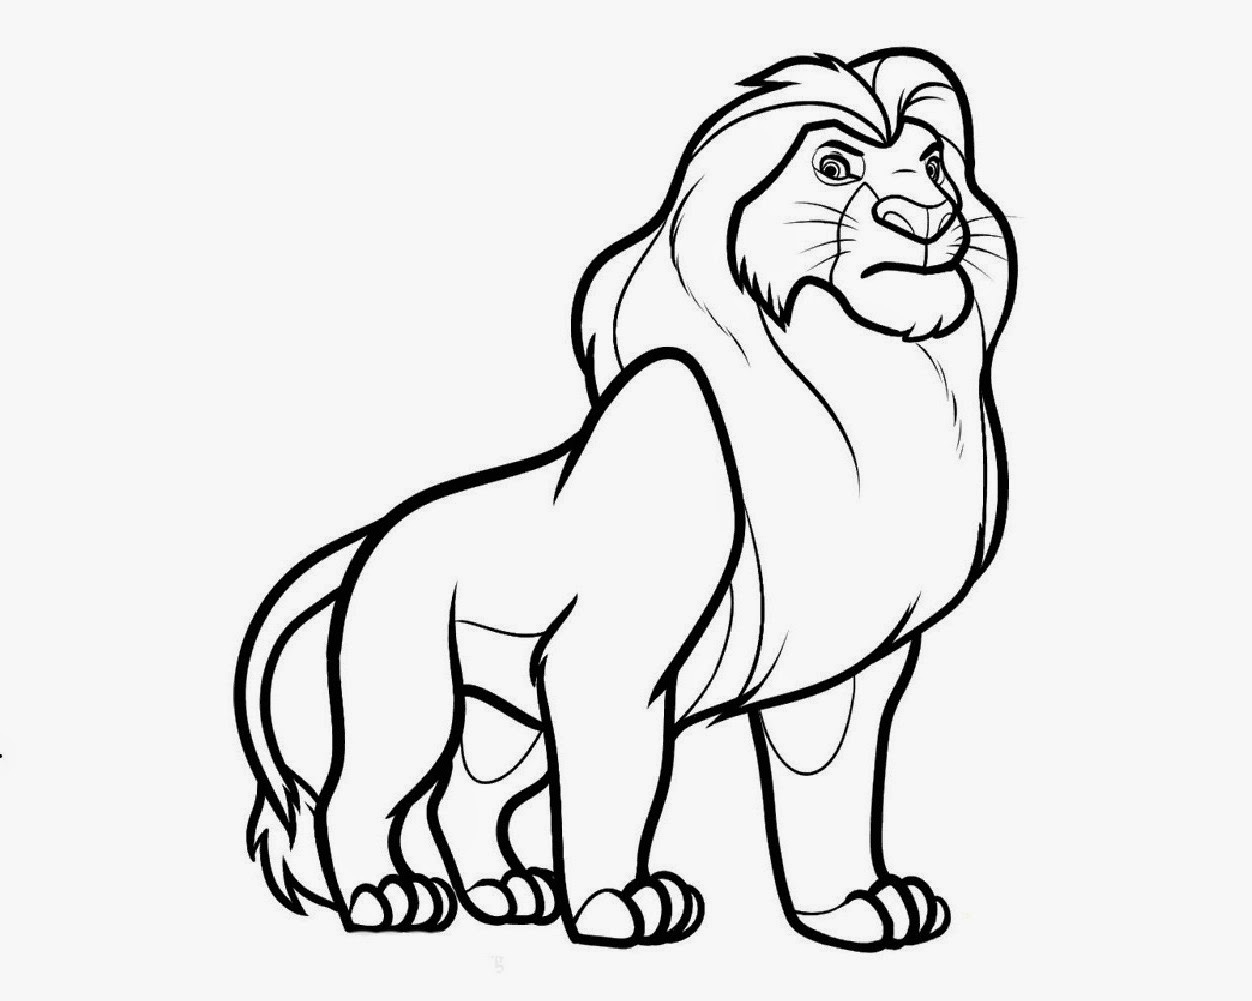 1252x1001 Disney Cartoons Drawing Easy Cartoon Drawings Of Animals Unique